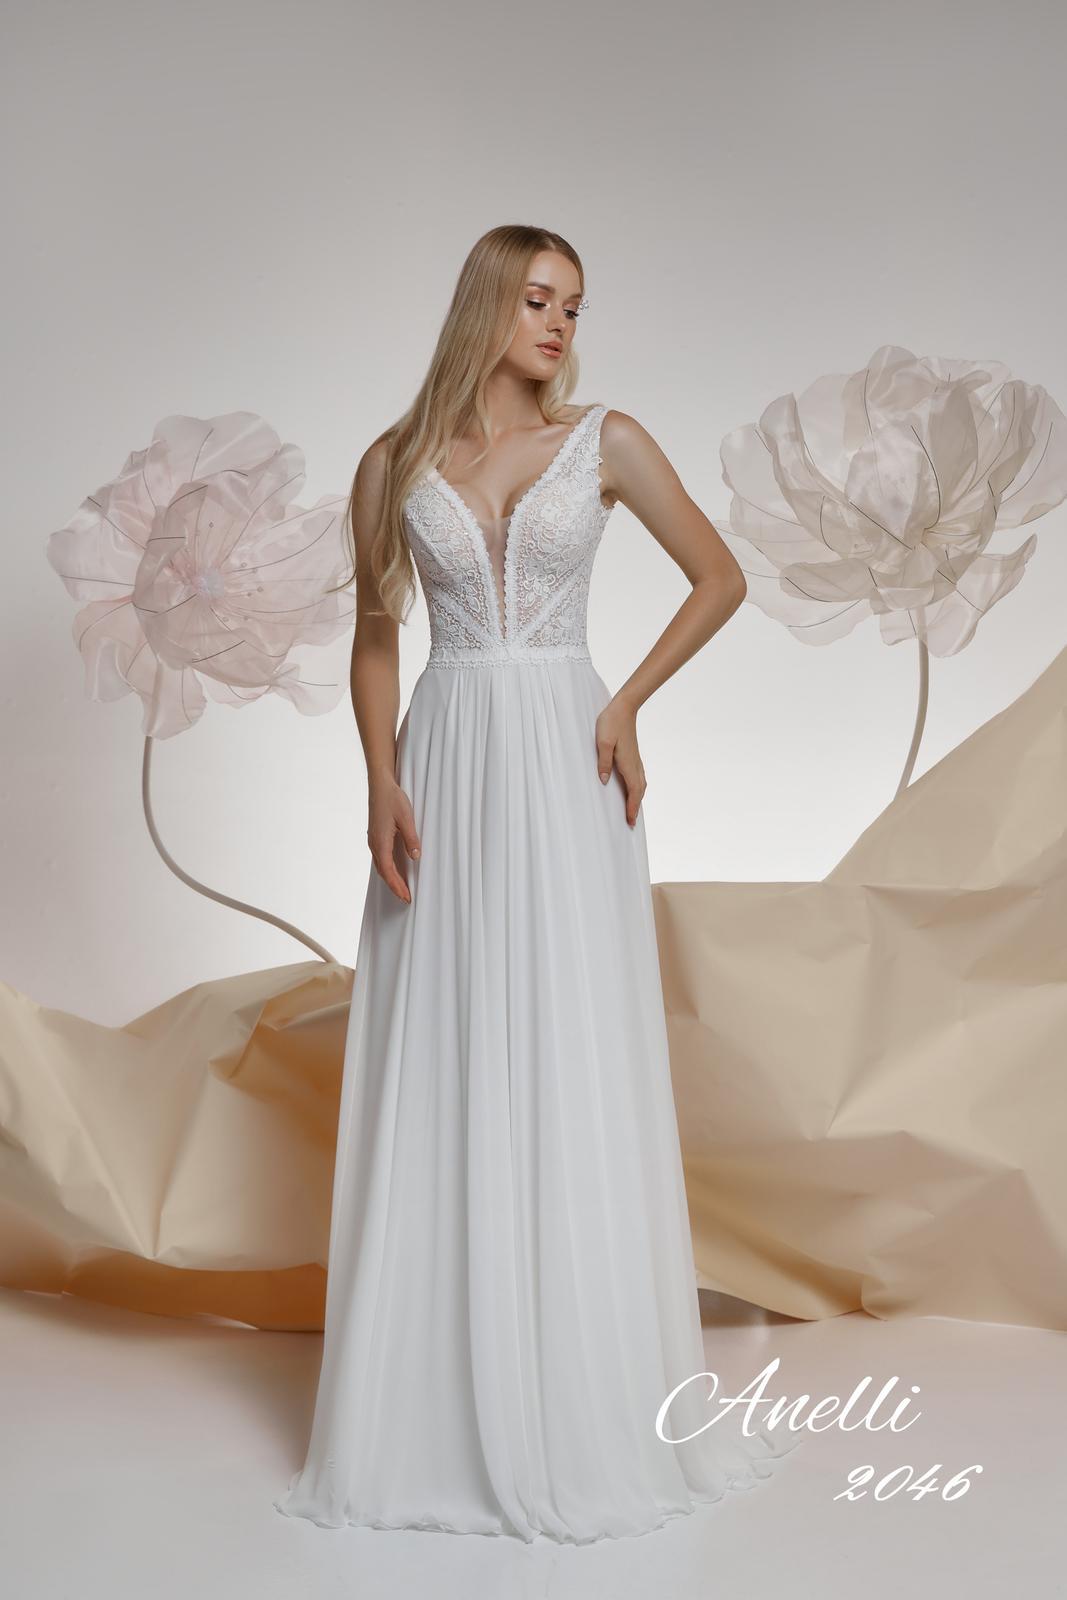 Svadobné šaty - Imagine 2046 - Obrázok č. 1